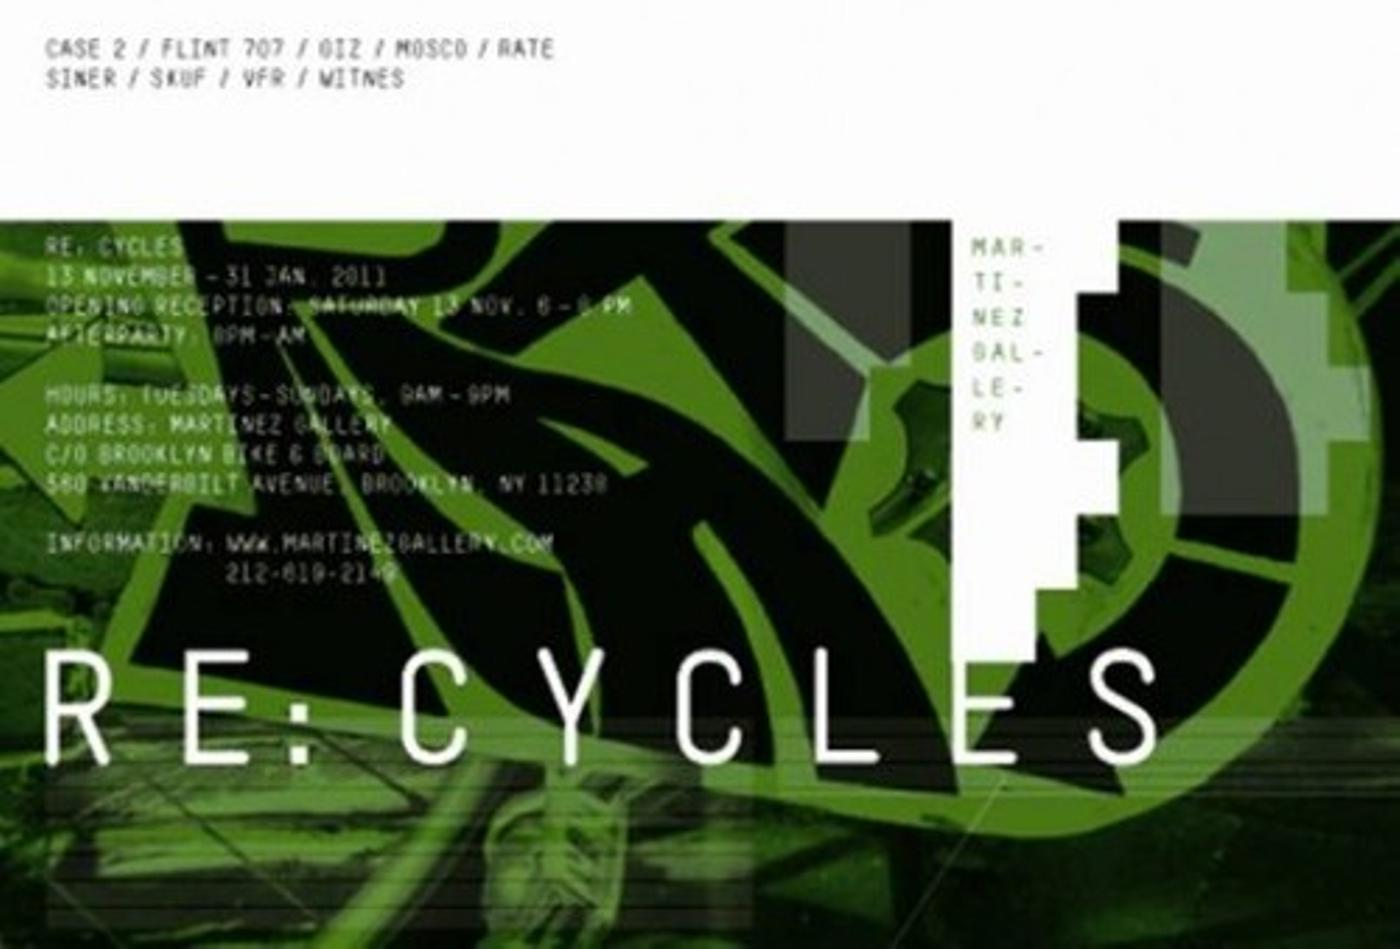 REcycles-PINP.jpg